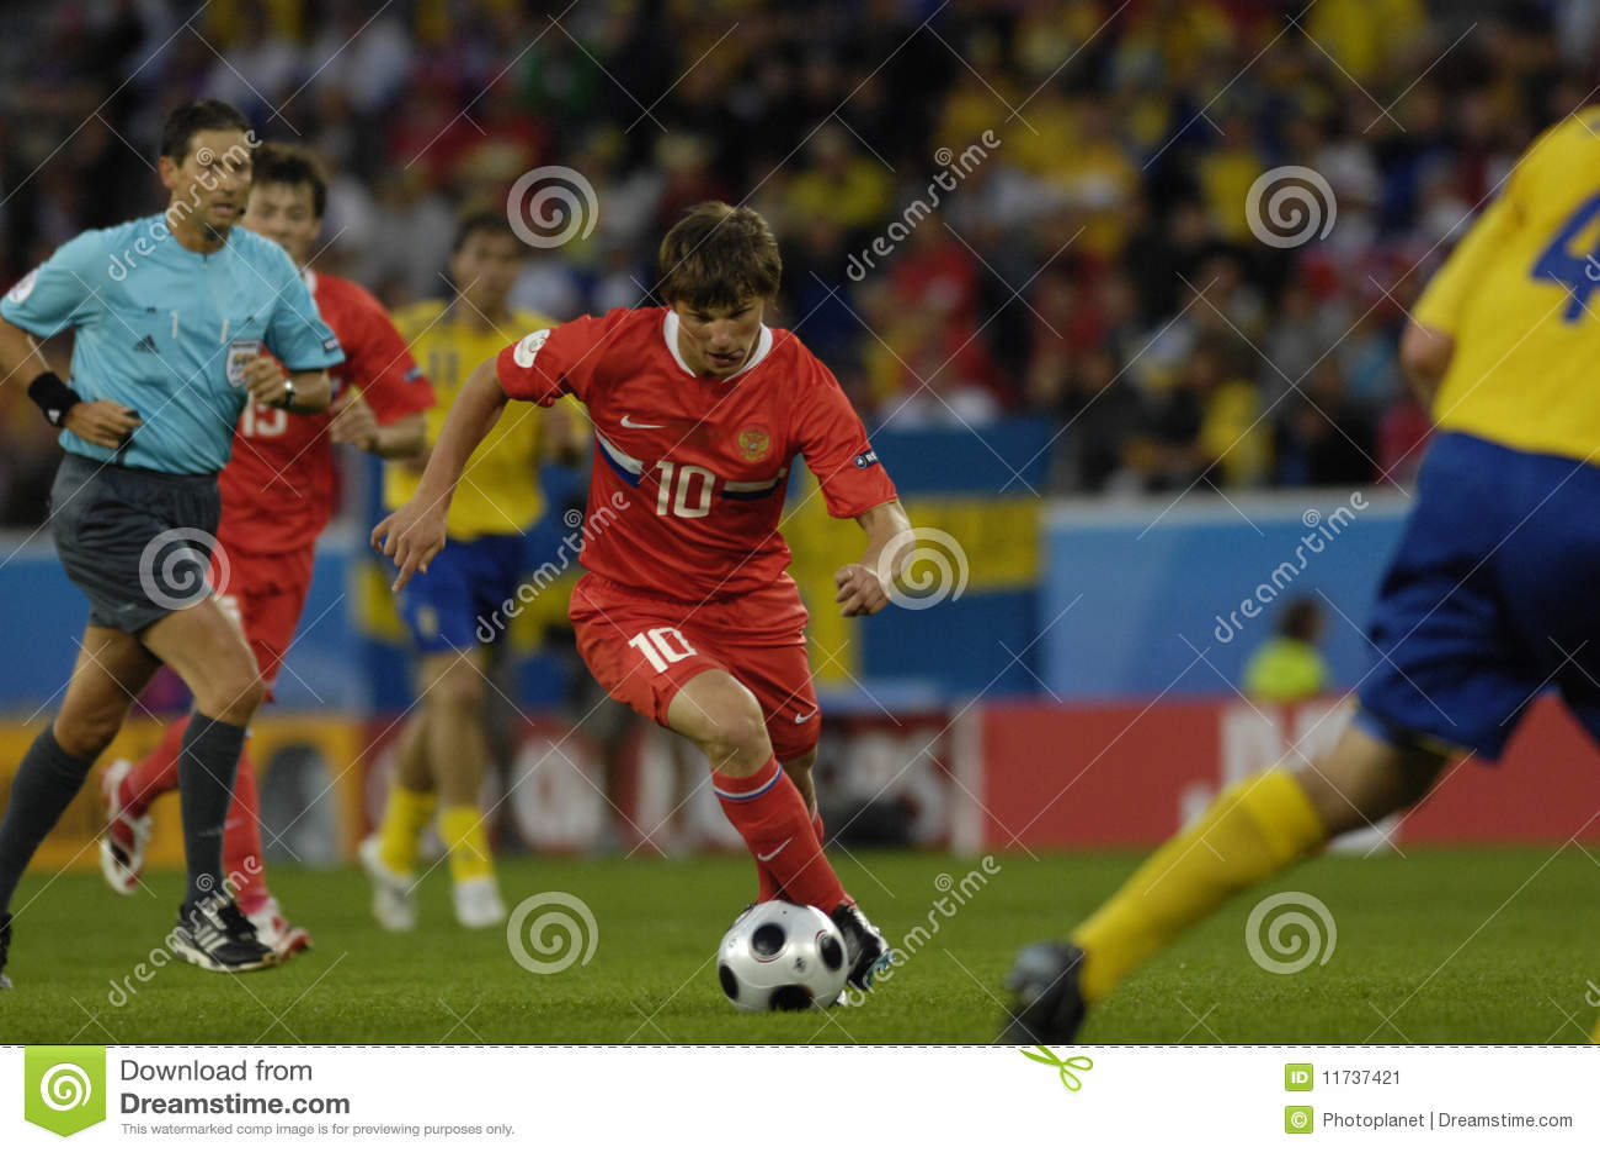 FranceFootball 2009 mejores 30Players Andrei Arshavin